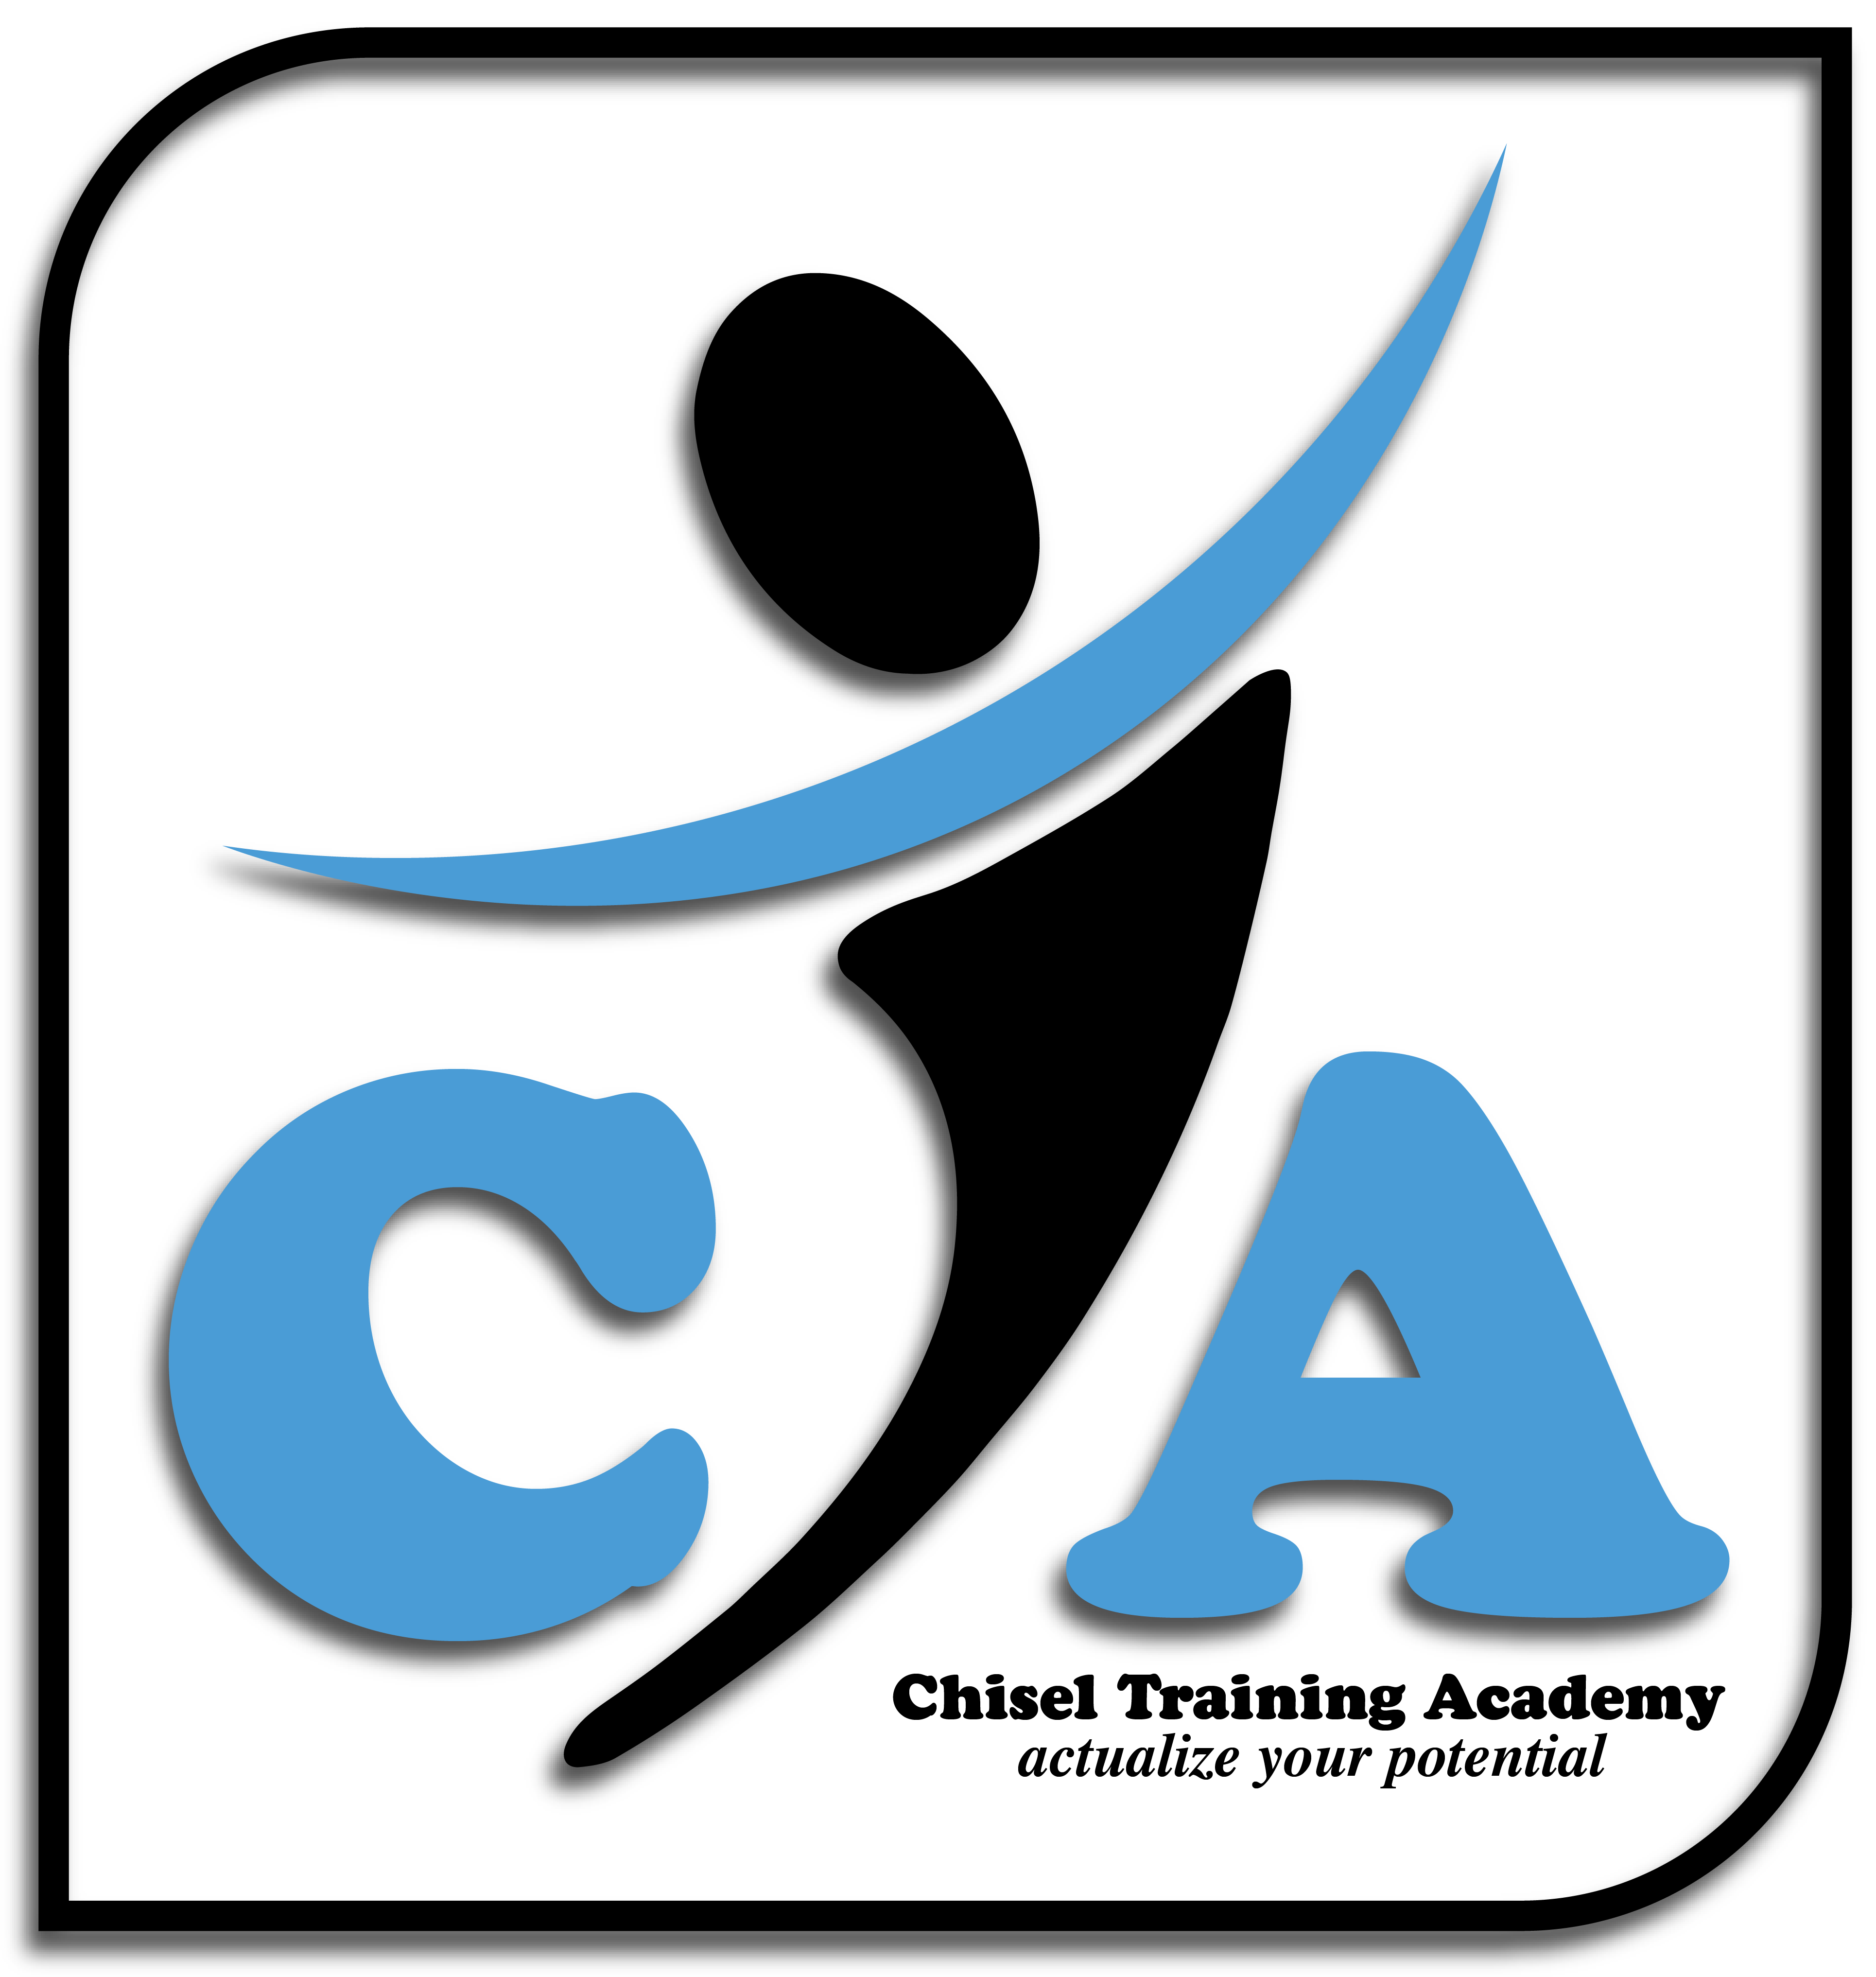 Chisel training academy